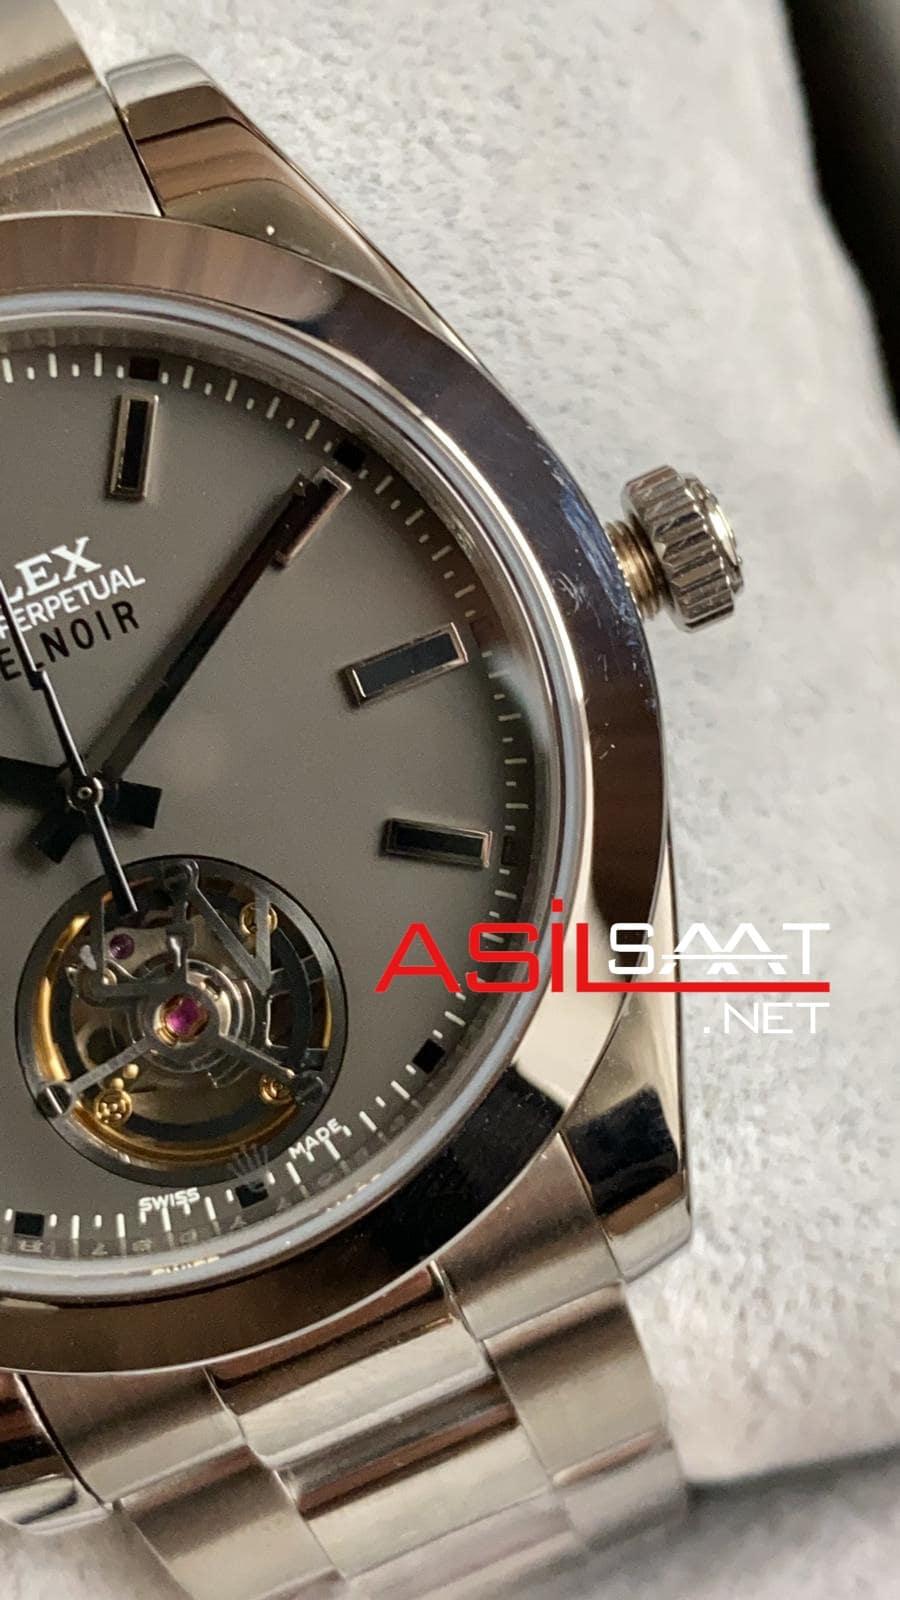 Rolex Label Noir Tourbillon Silver Replika Saat ROLNOR001